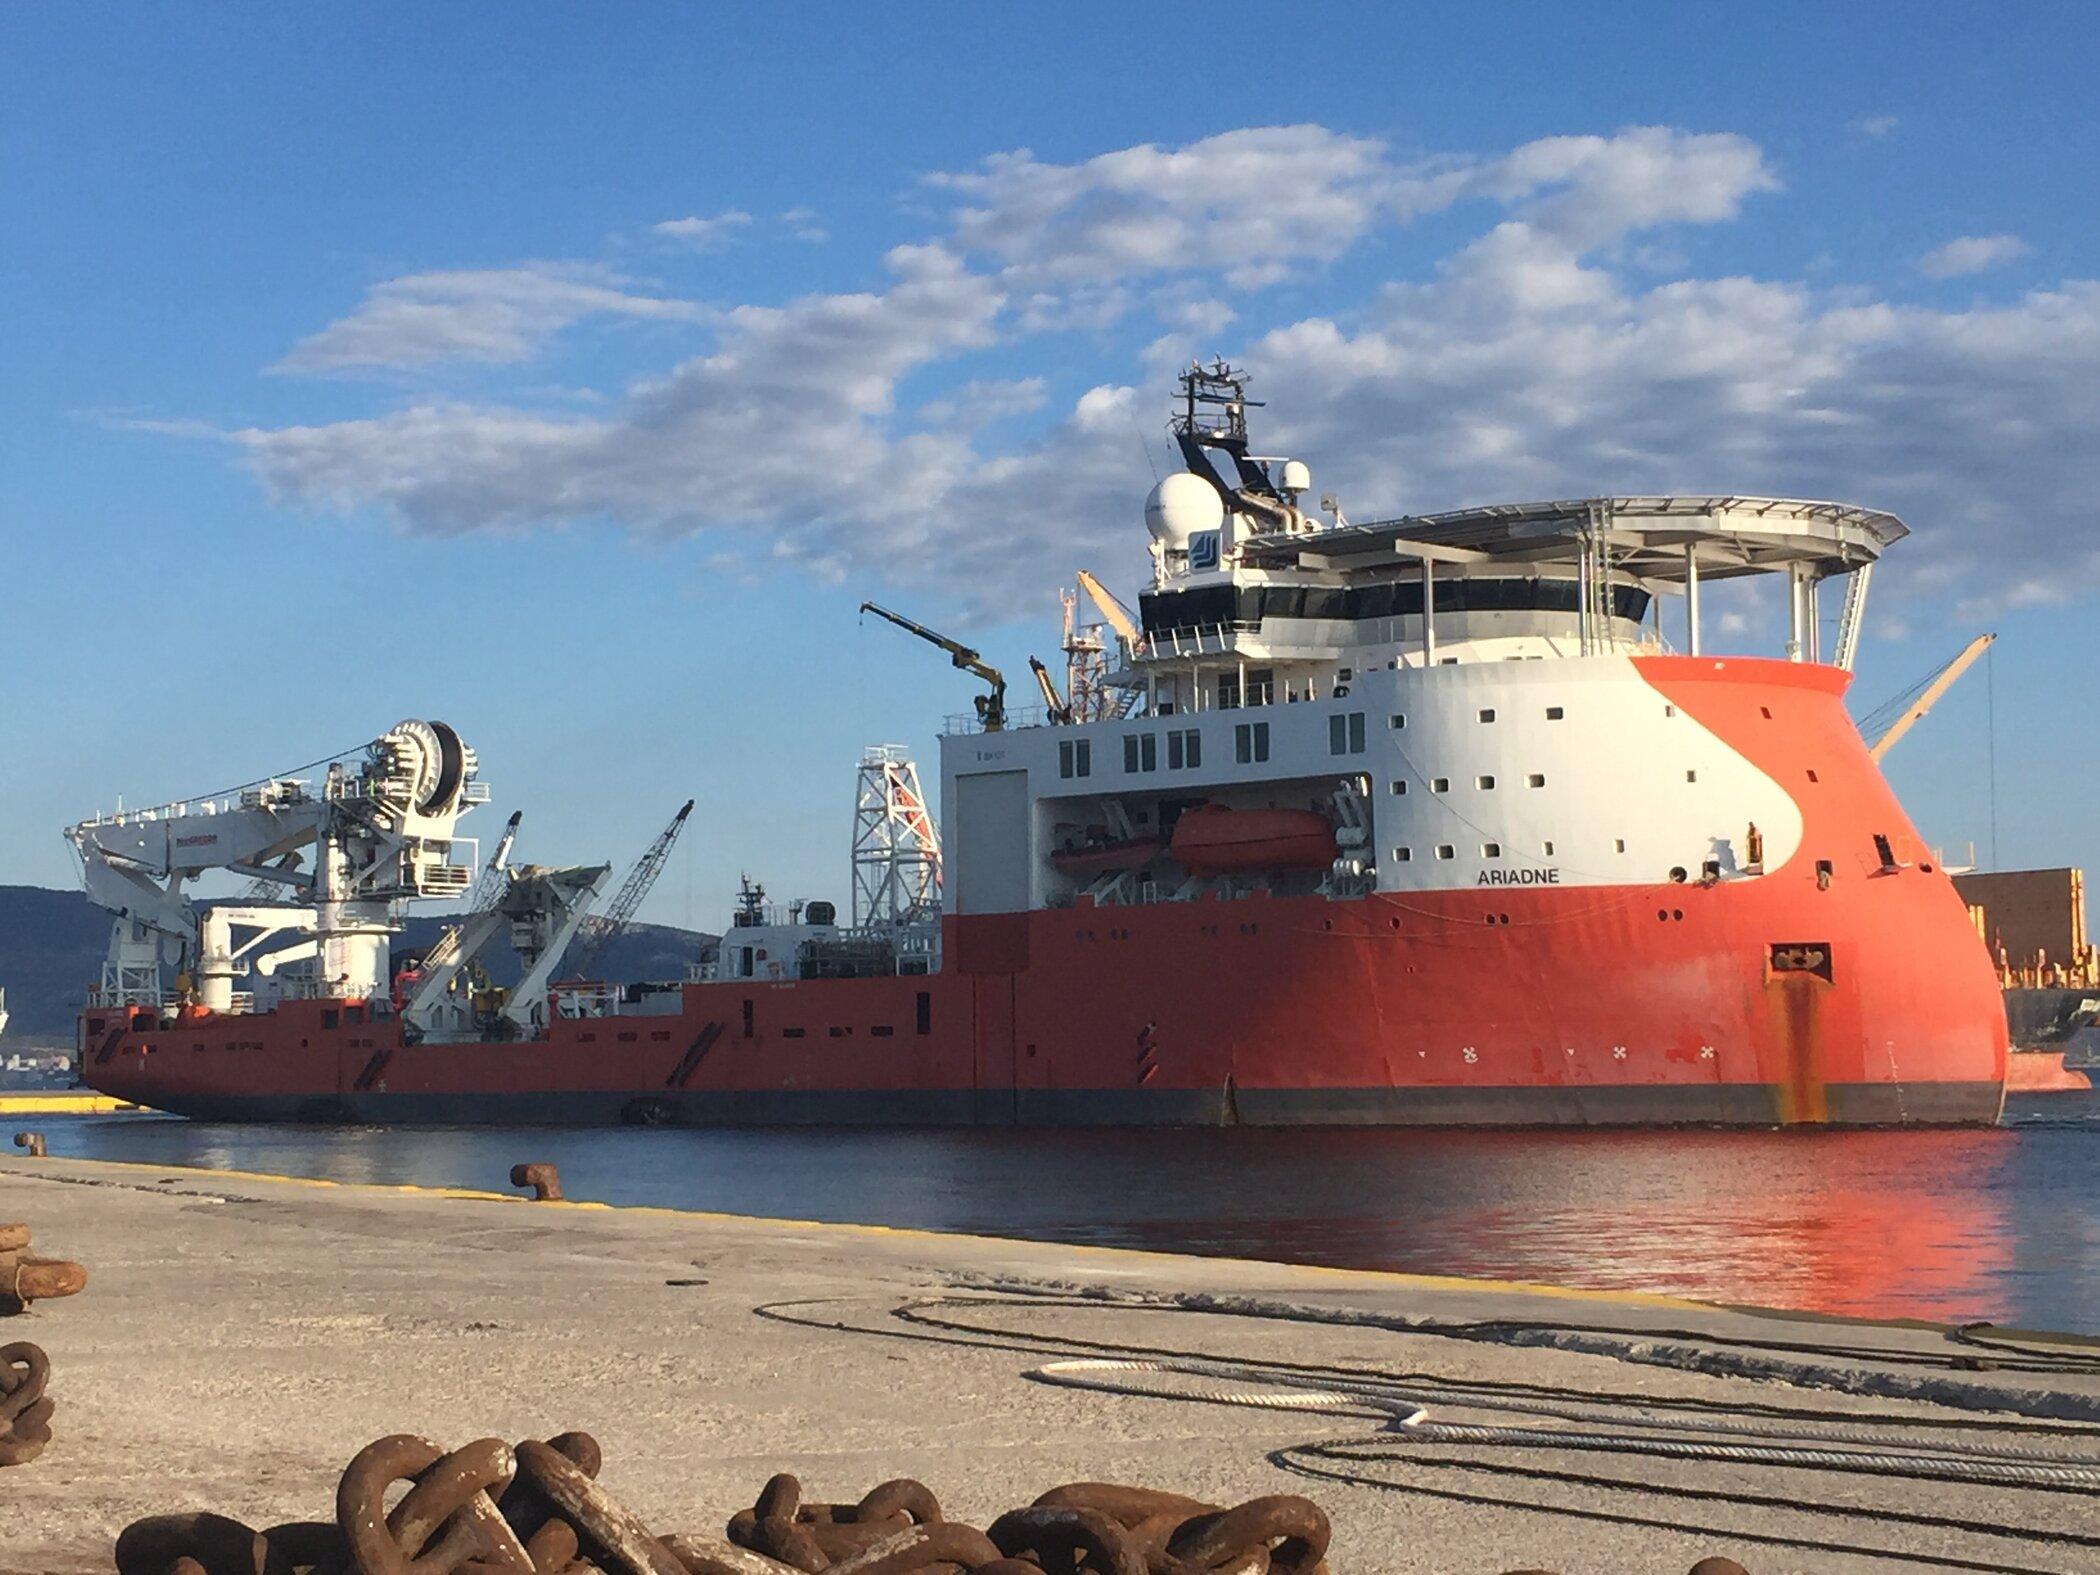 Ariadne arriving at Elefsis port